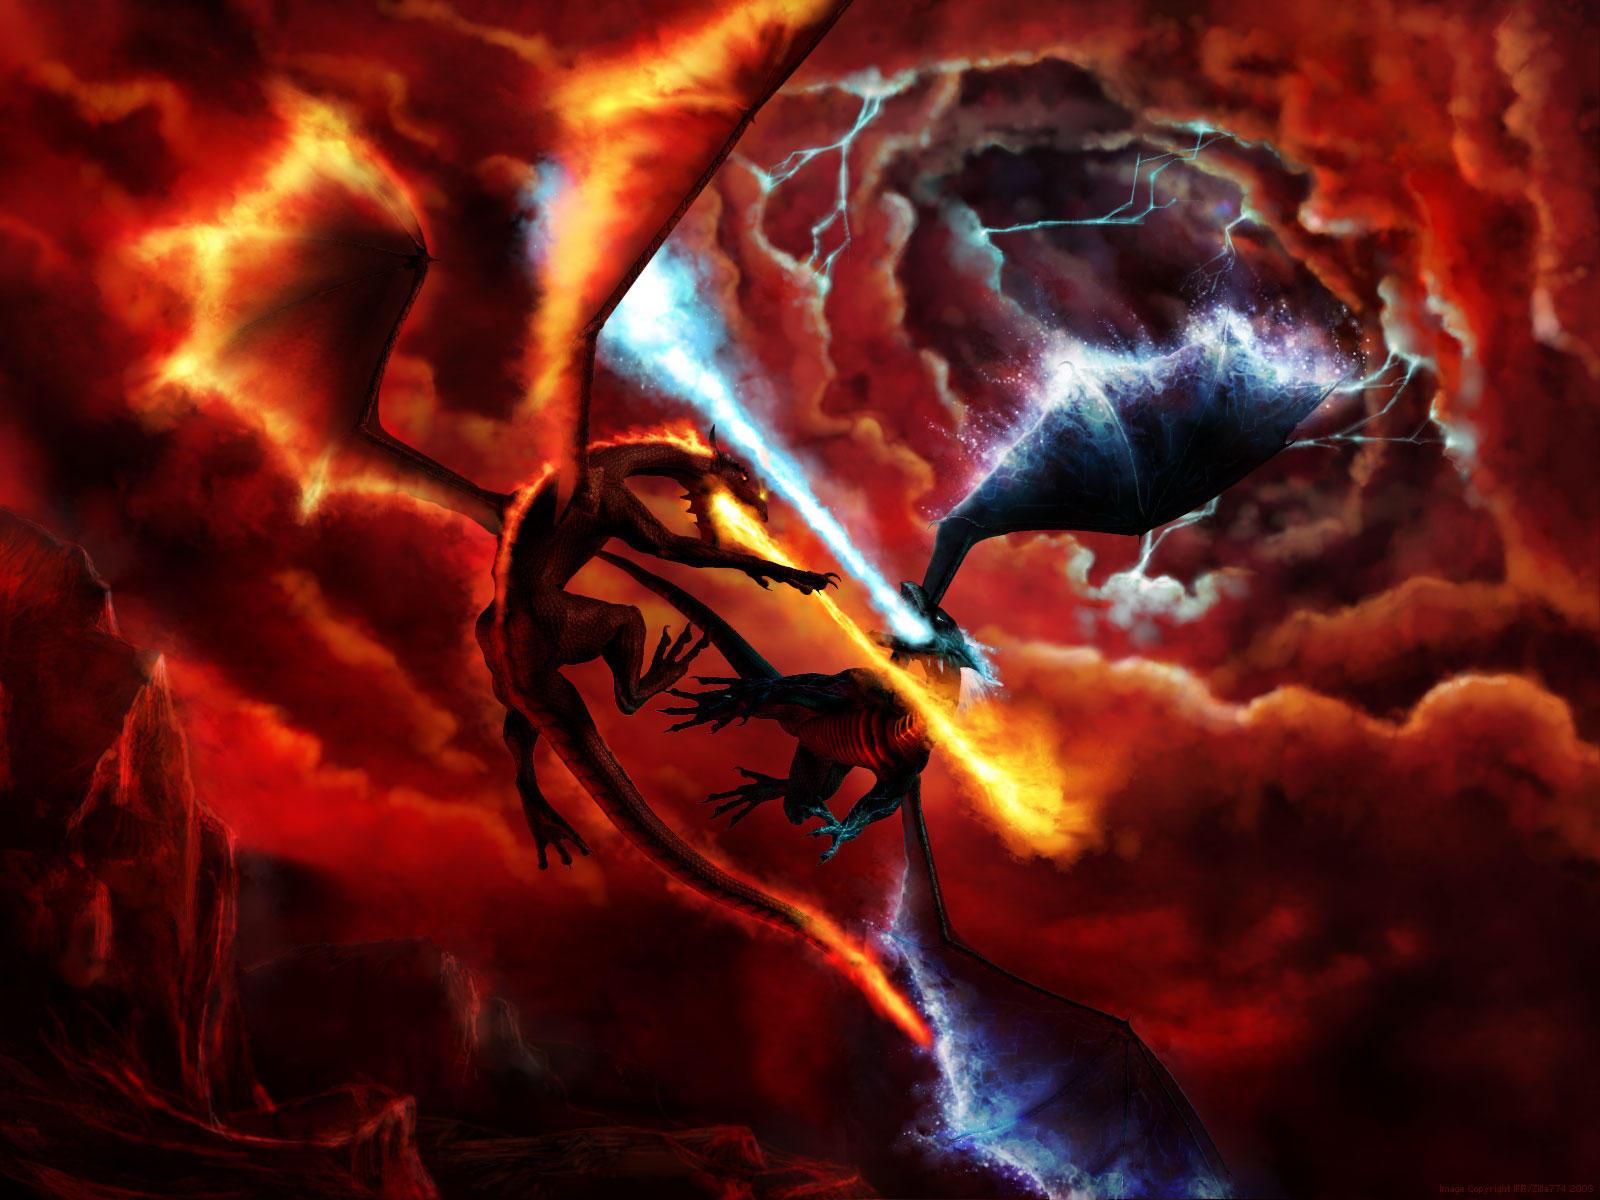 Lightning Dragons Vs Fire Dragon | www.pixshark.com ... Fire Vs Lightning